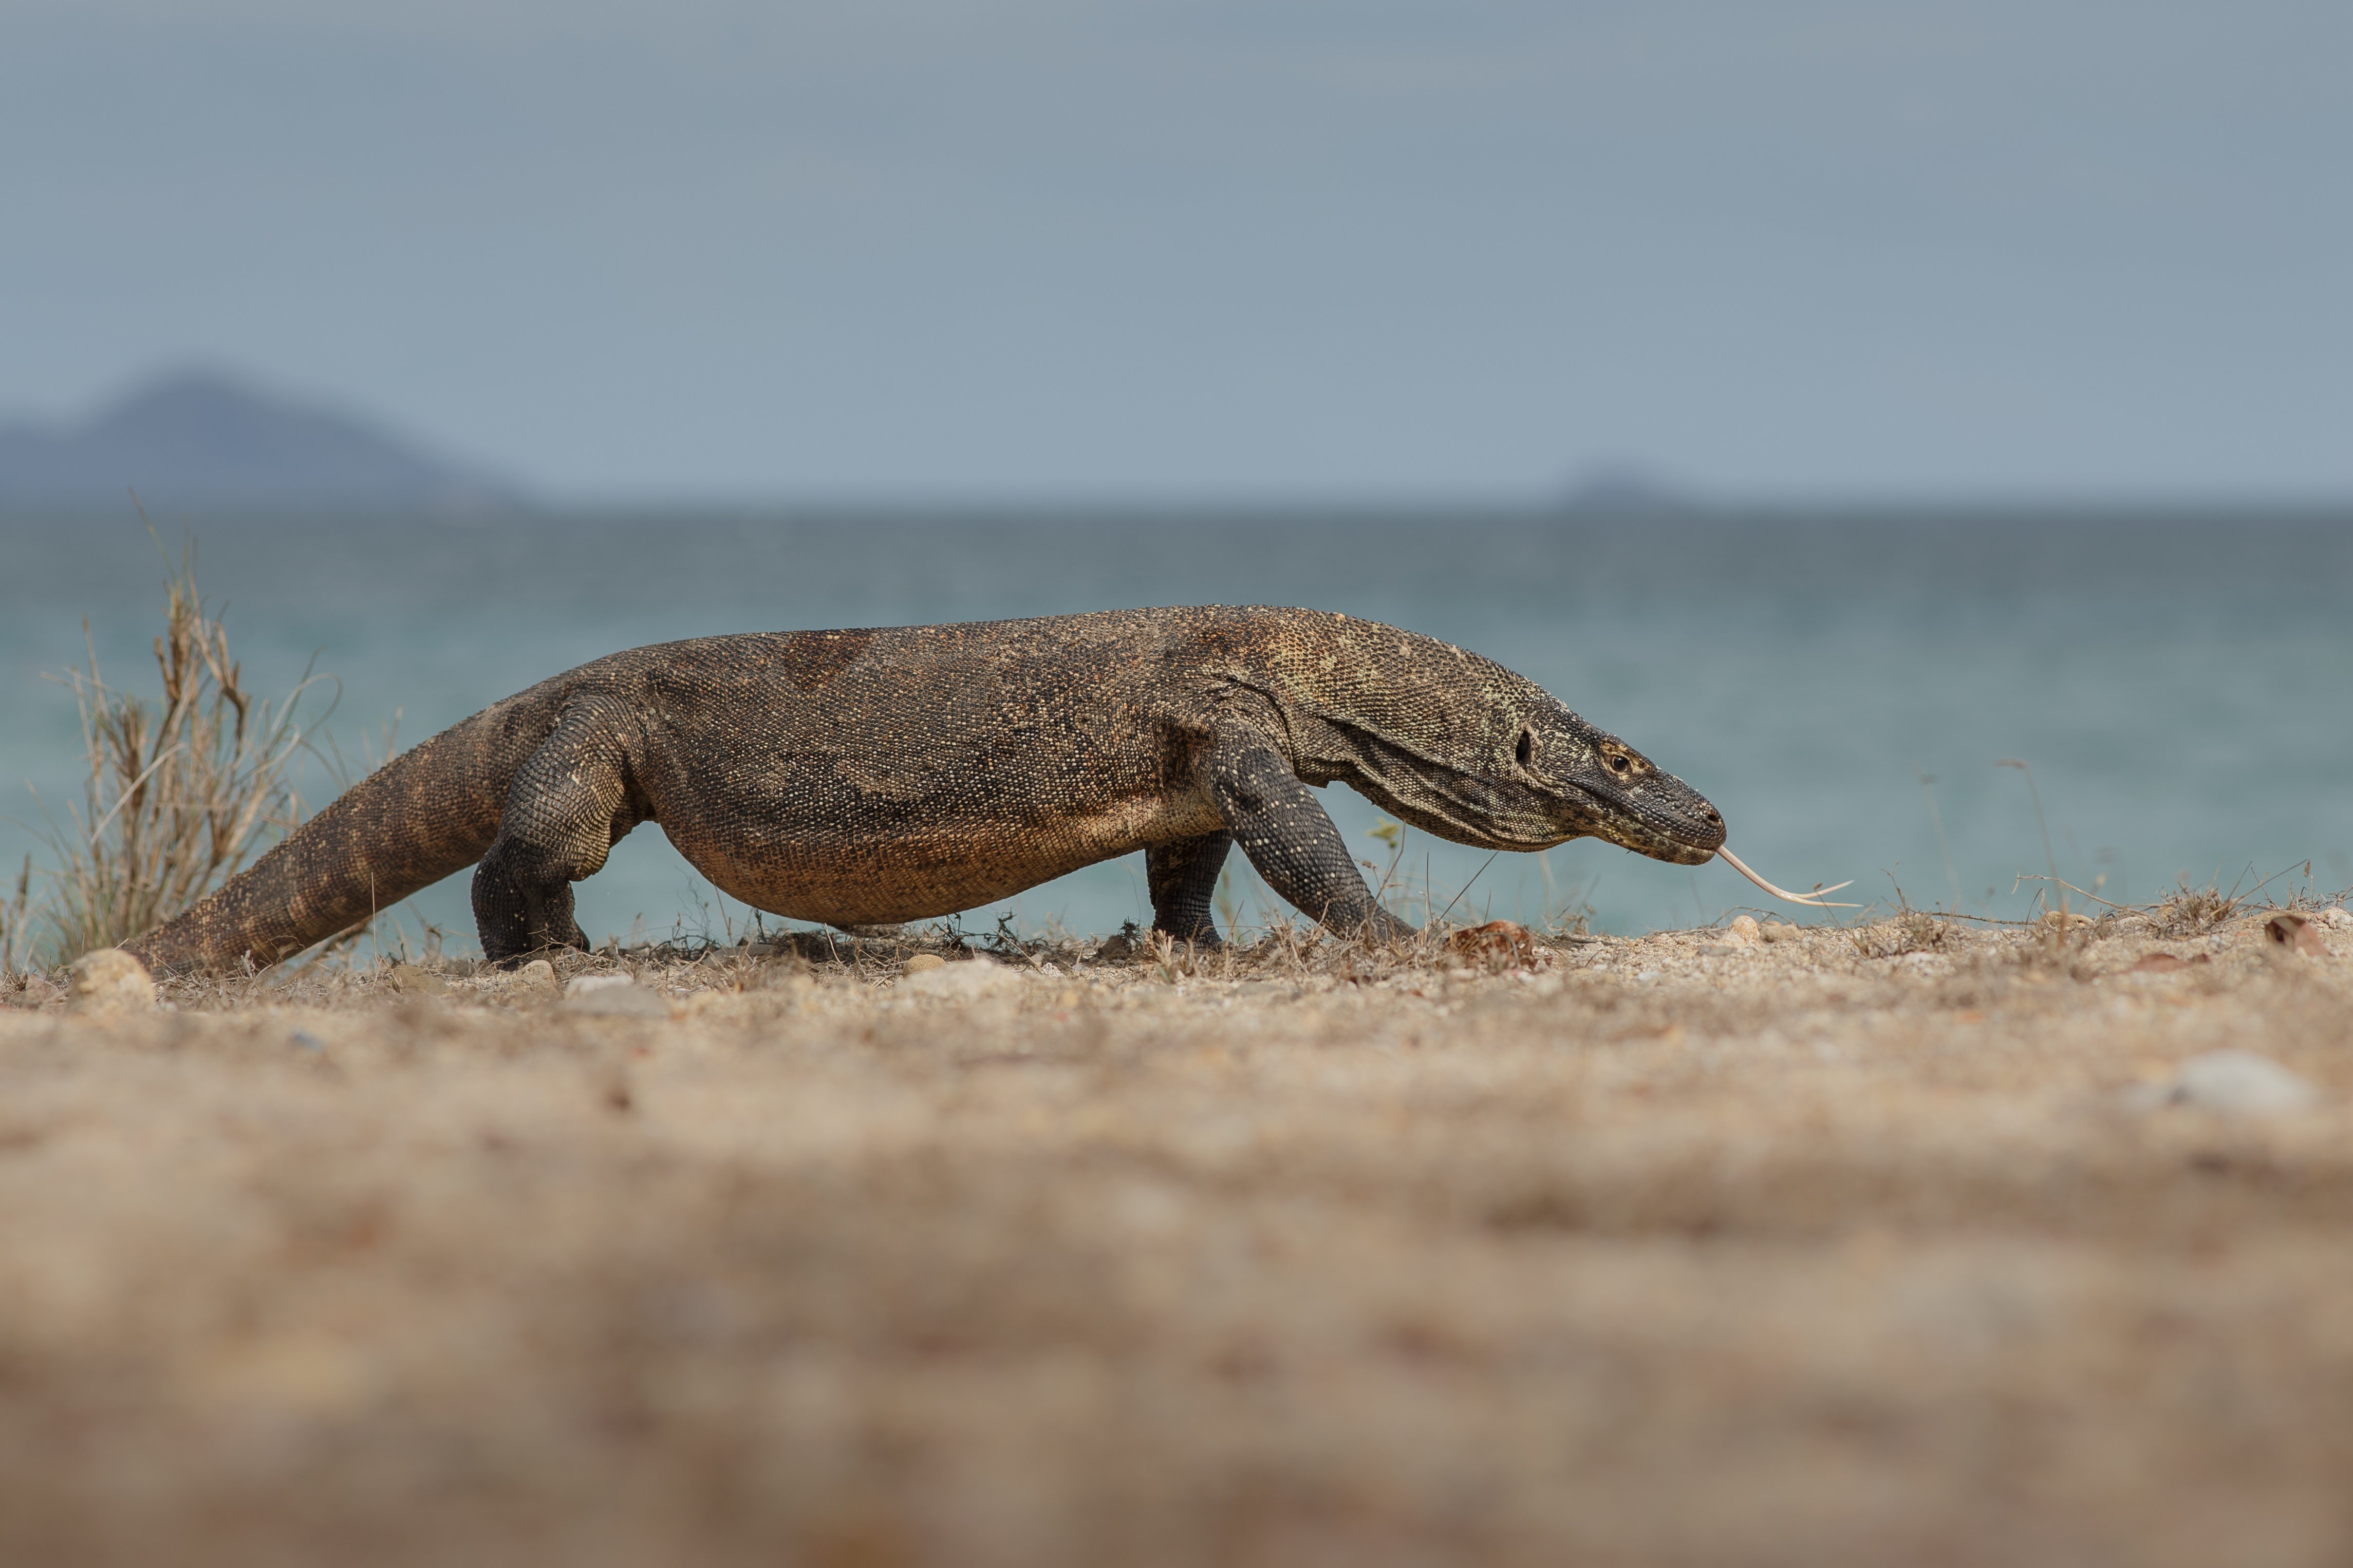 Komodowaran am Strand